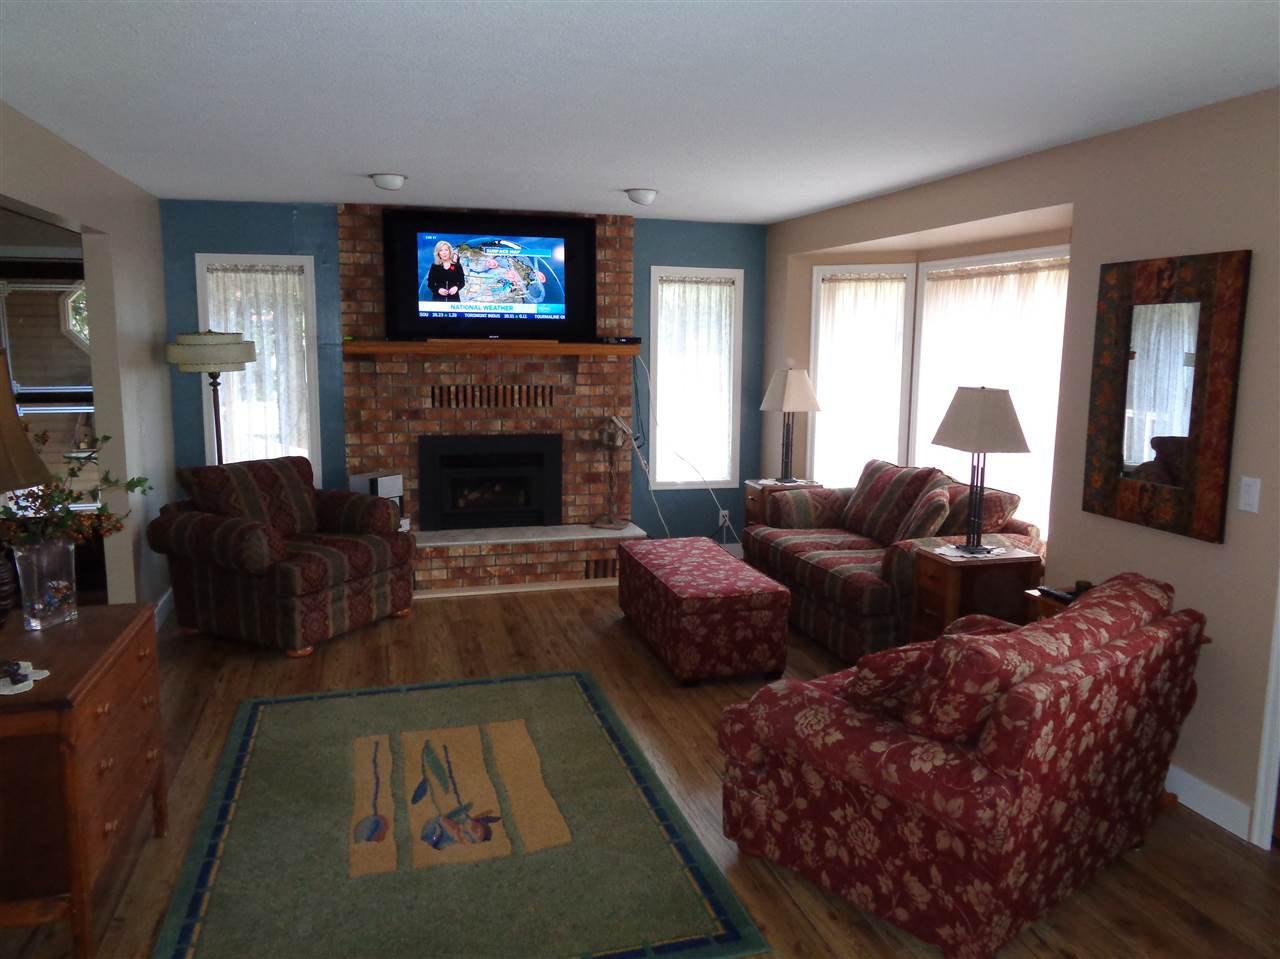 "Main Photo: 27B 7001 EDEN Drive in Sardis: Sardis West Vedder Rd Townhouse for sale in ""EDENBANK"" : MLS®# R2121288"